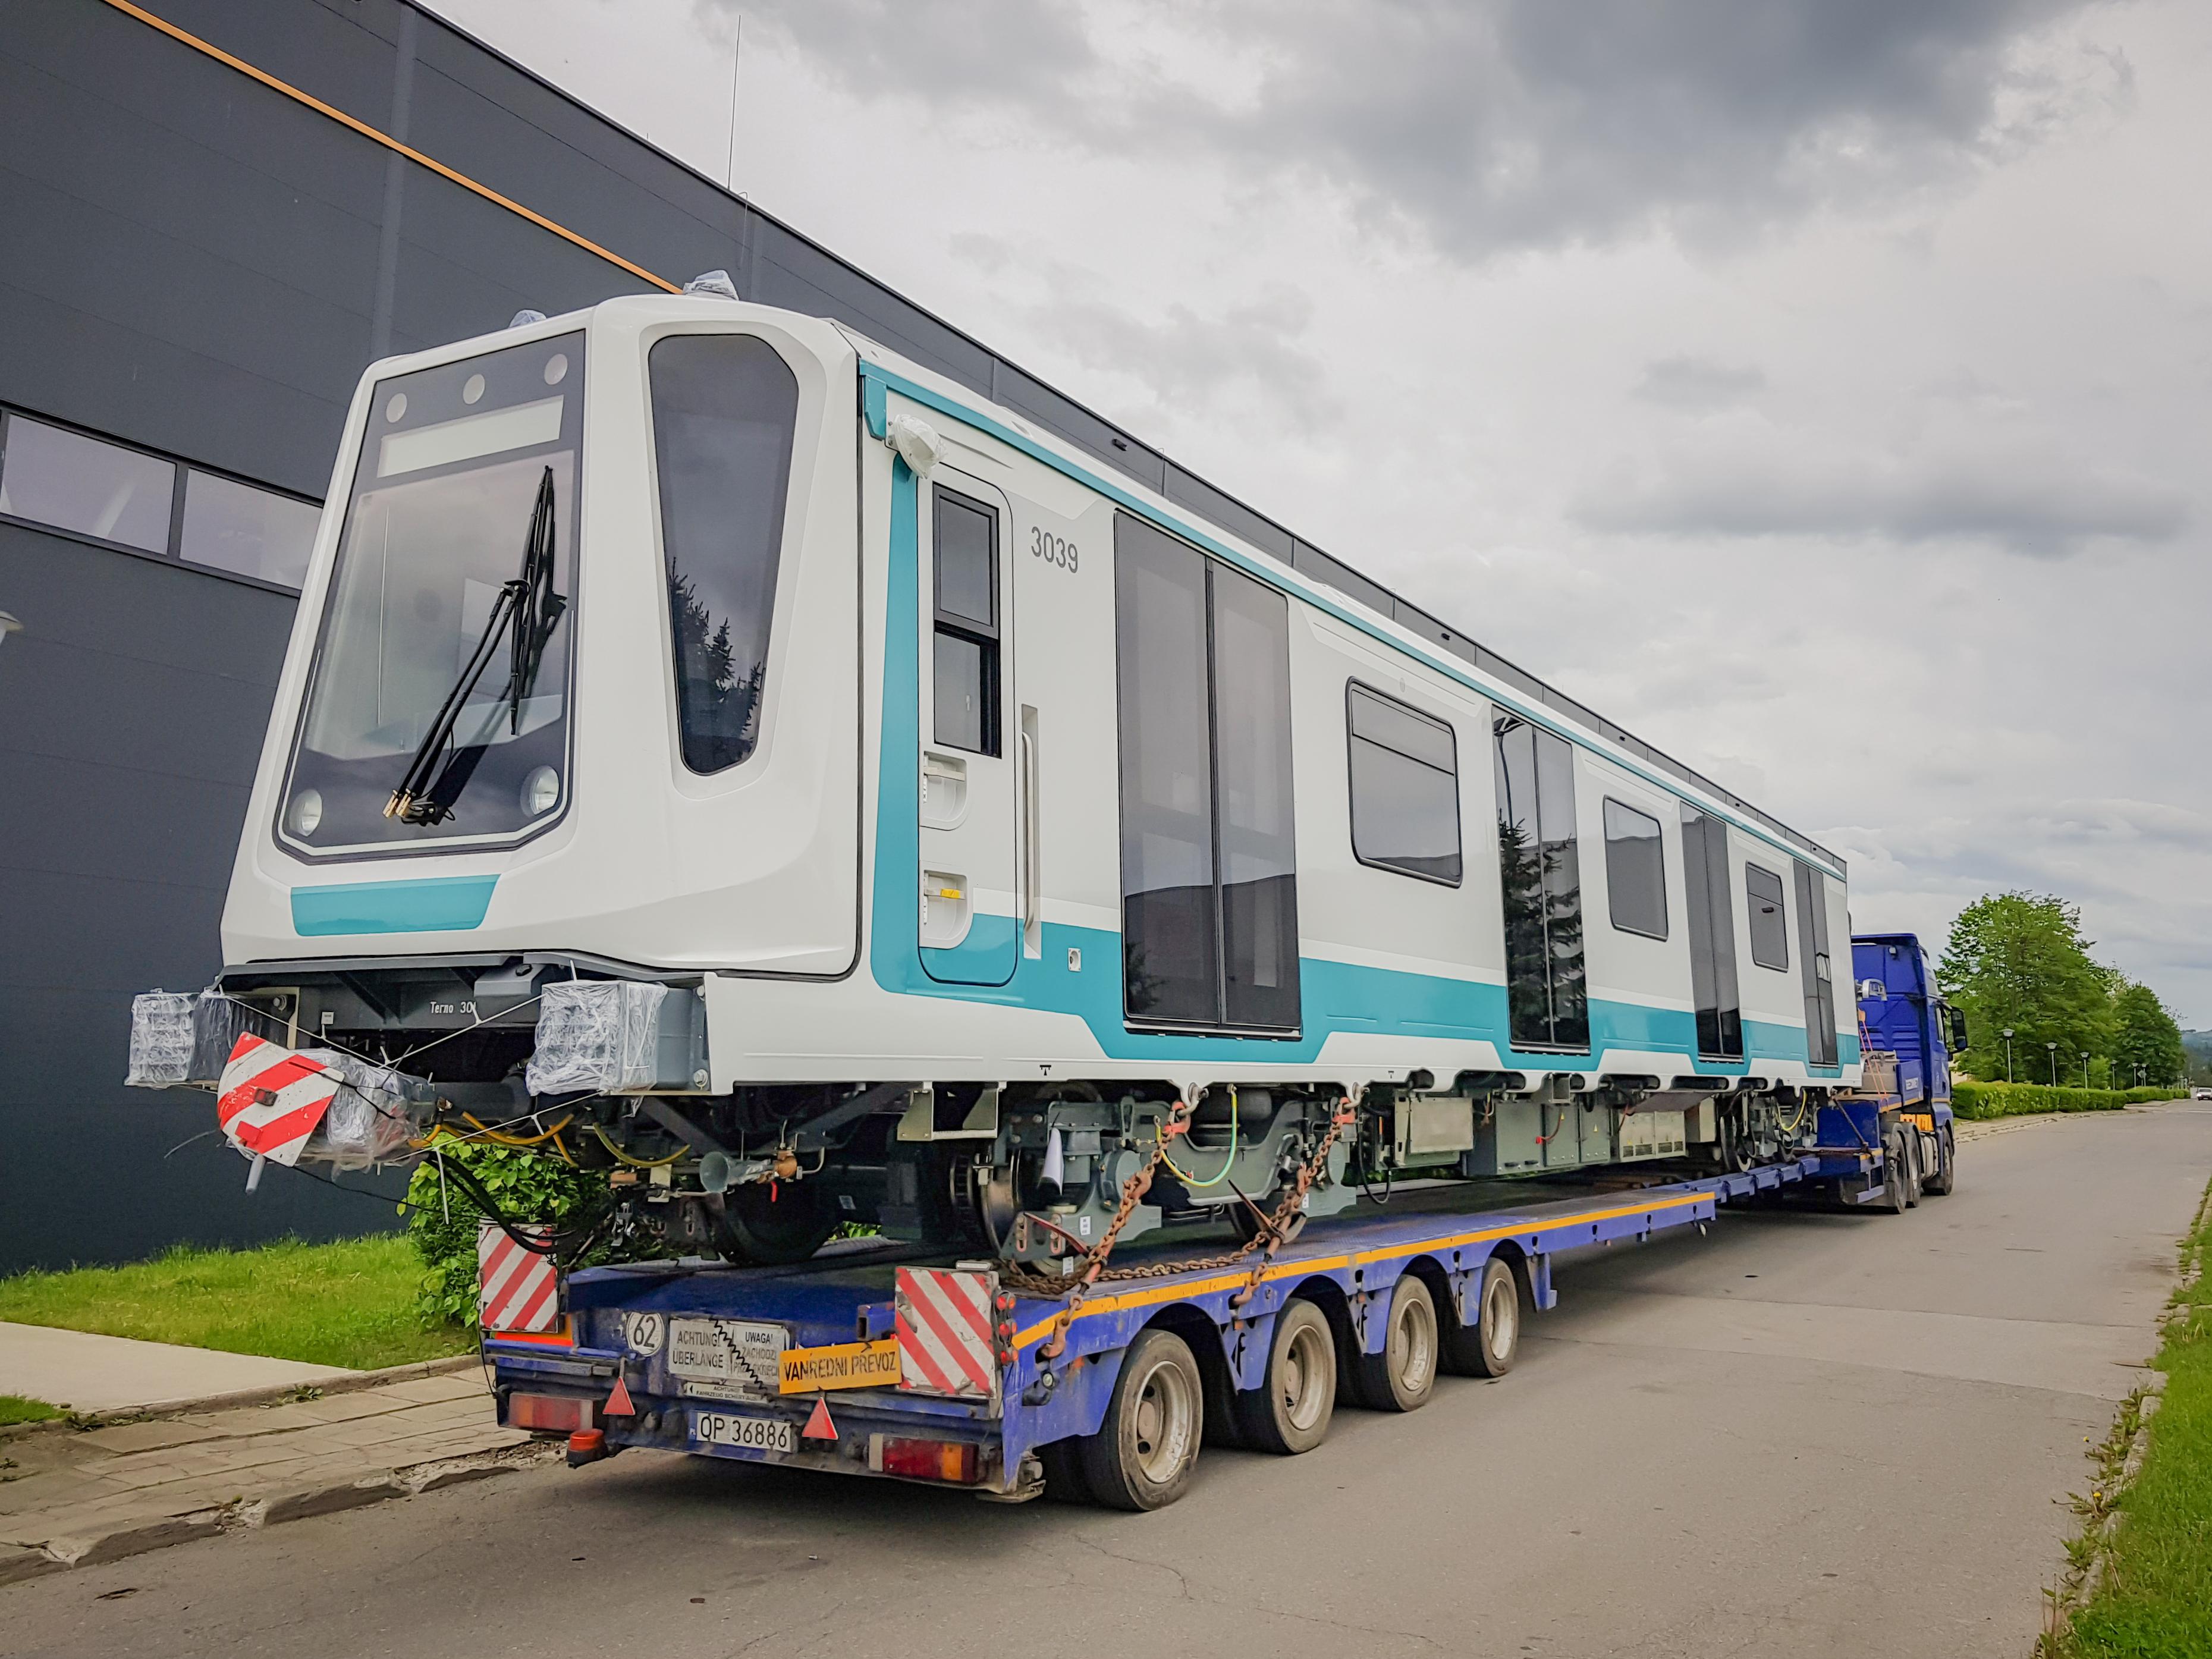 Twentieth Metro Train on its Way to Sofia